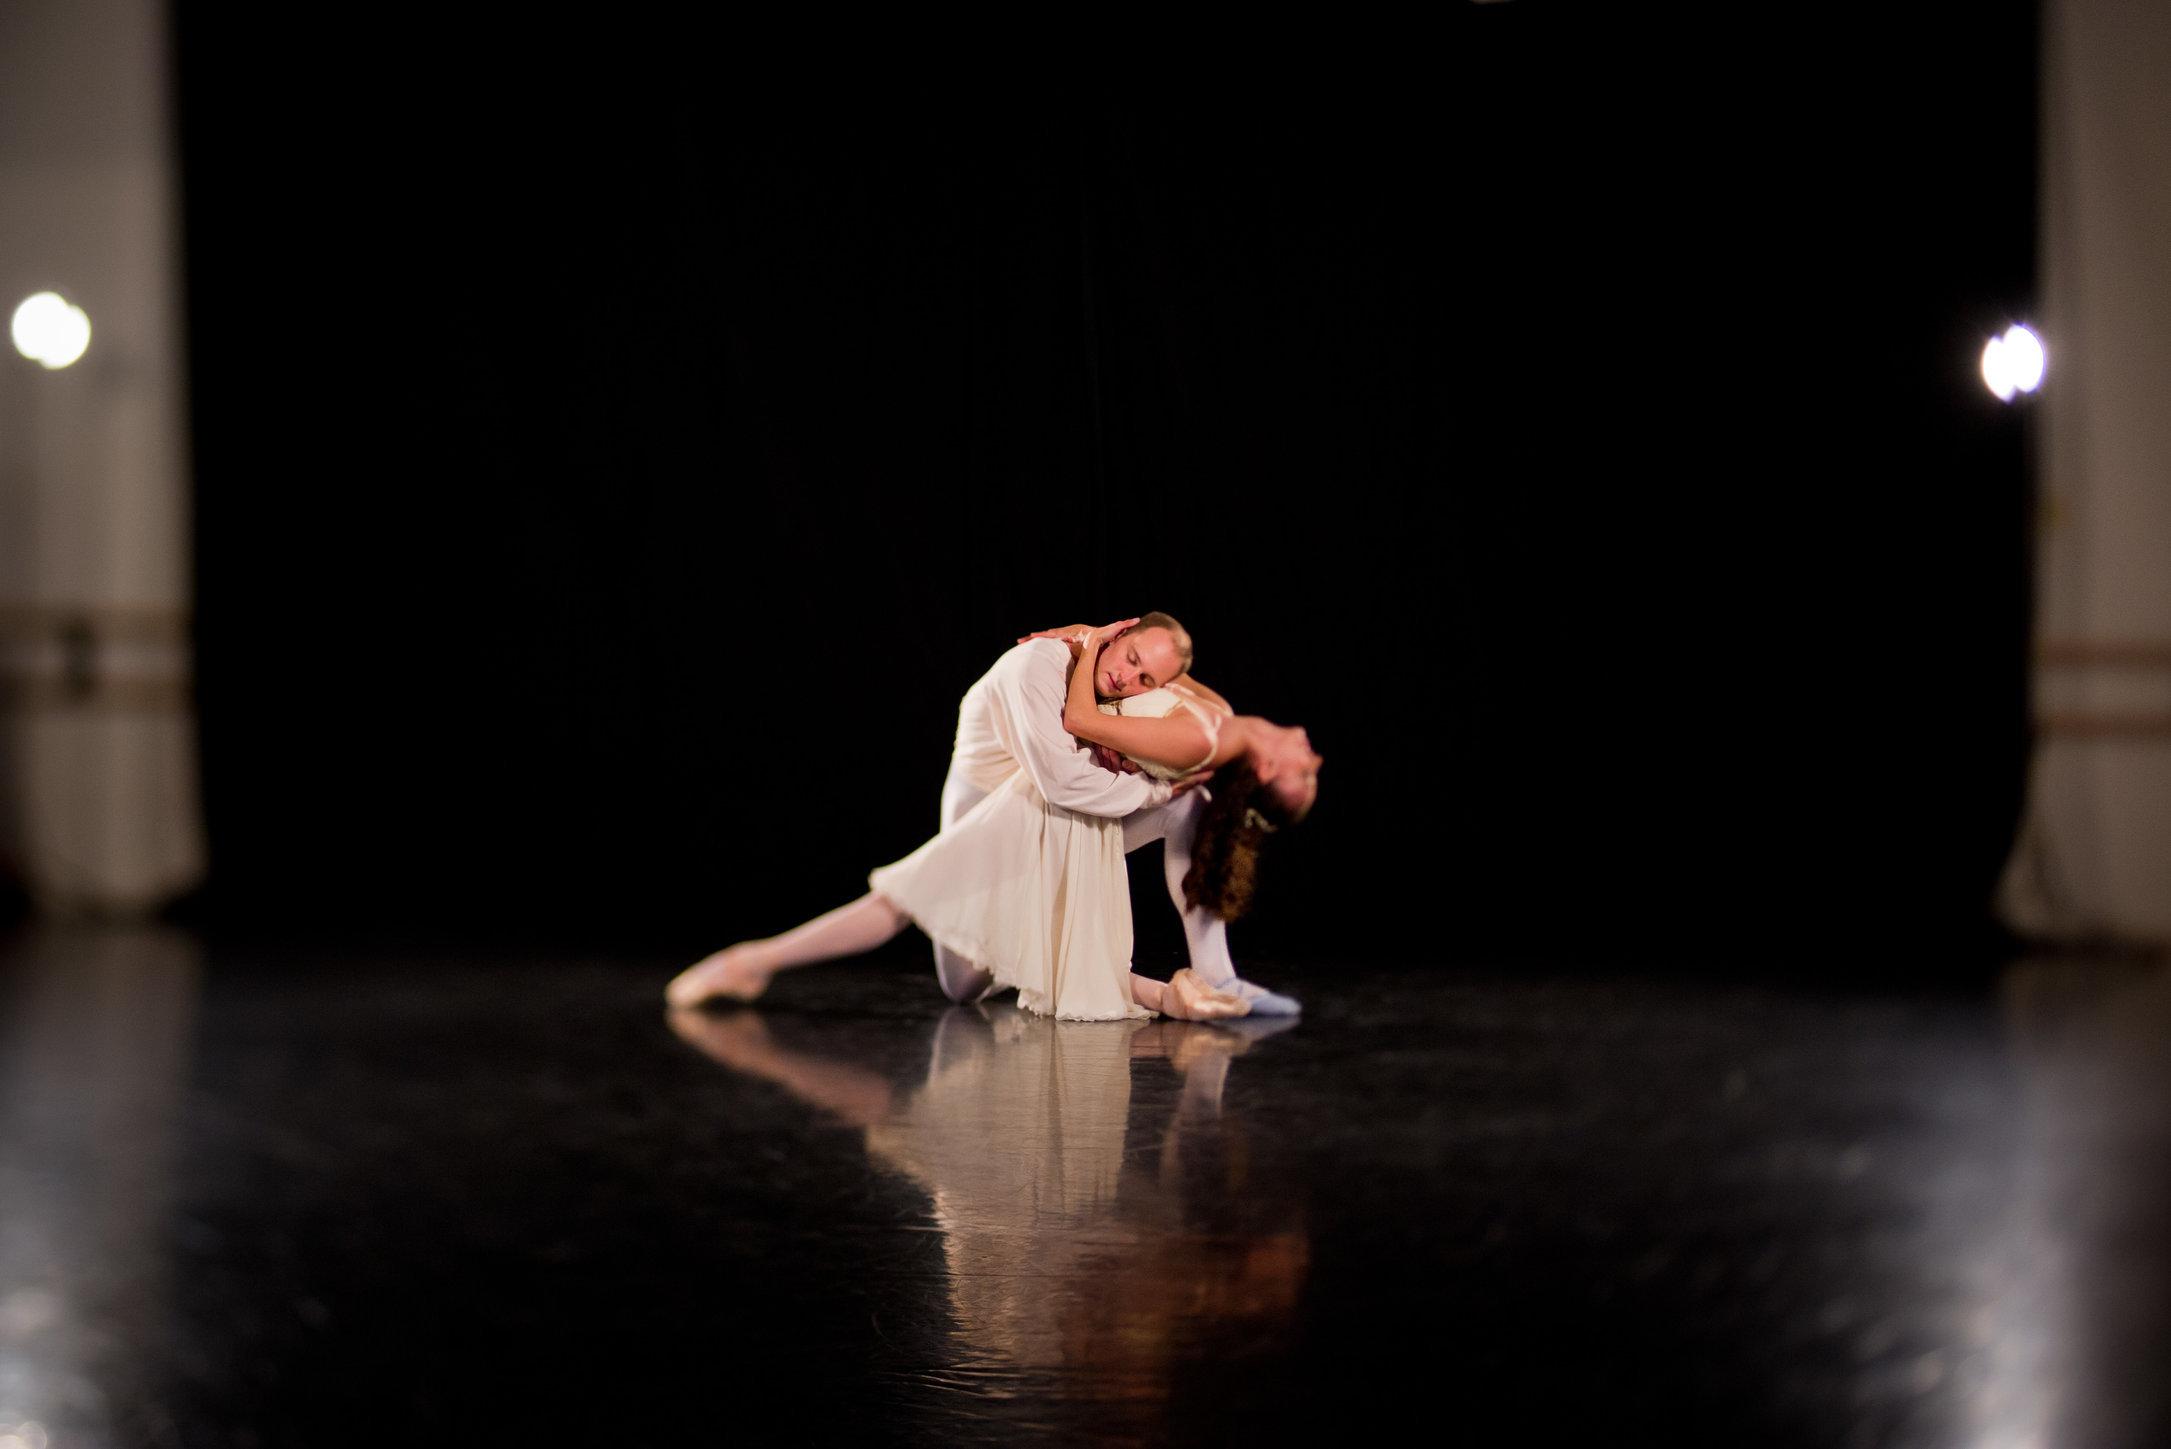 MANNY_DANCE_17.JPG